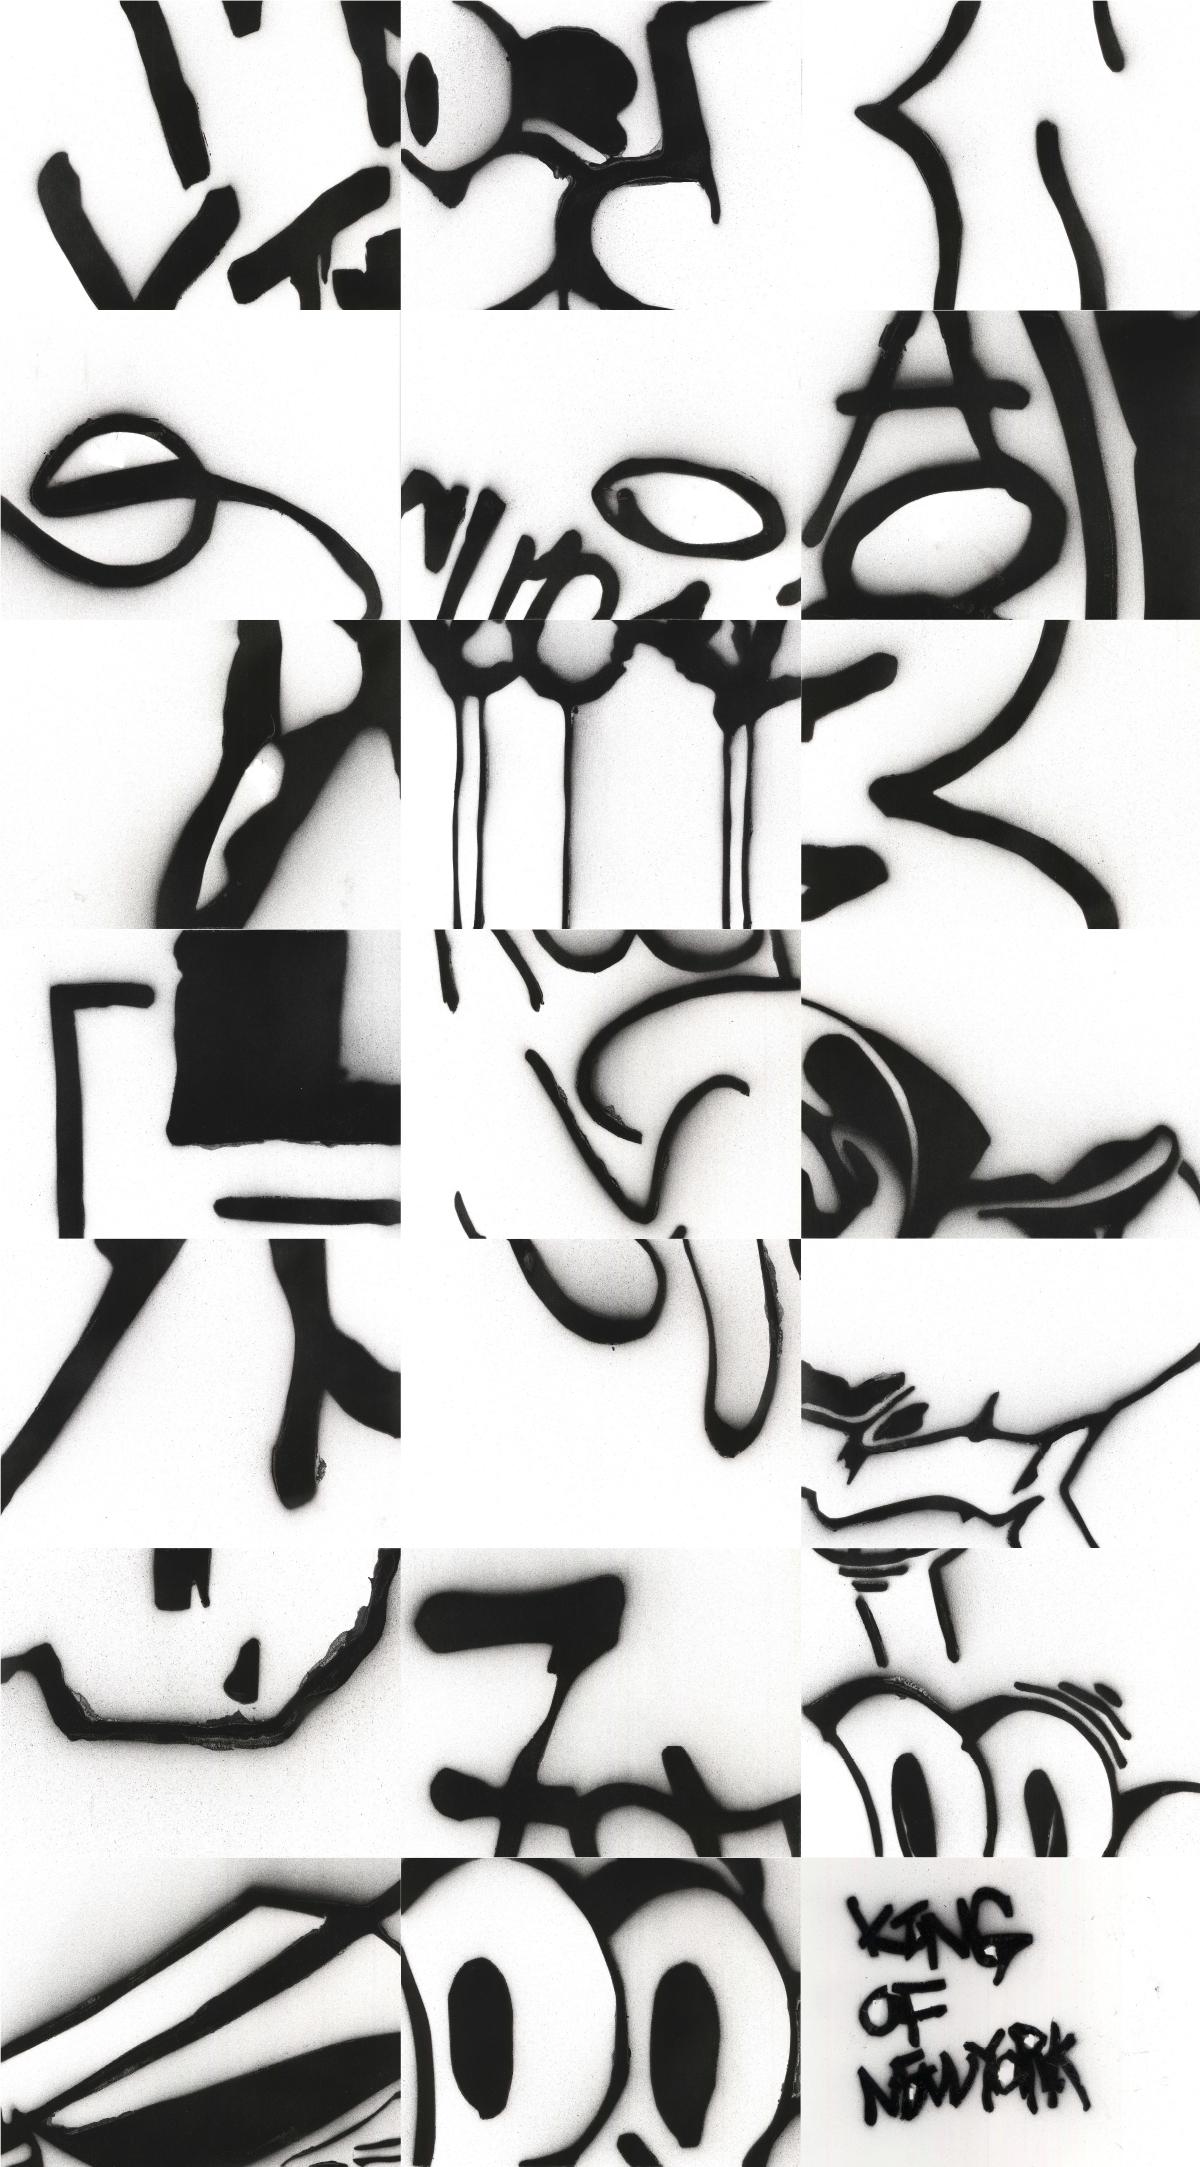 Graffiti-final.jpg